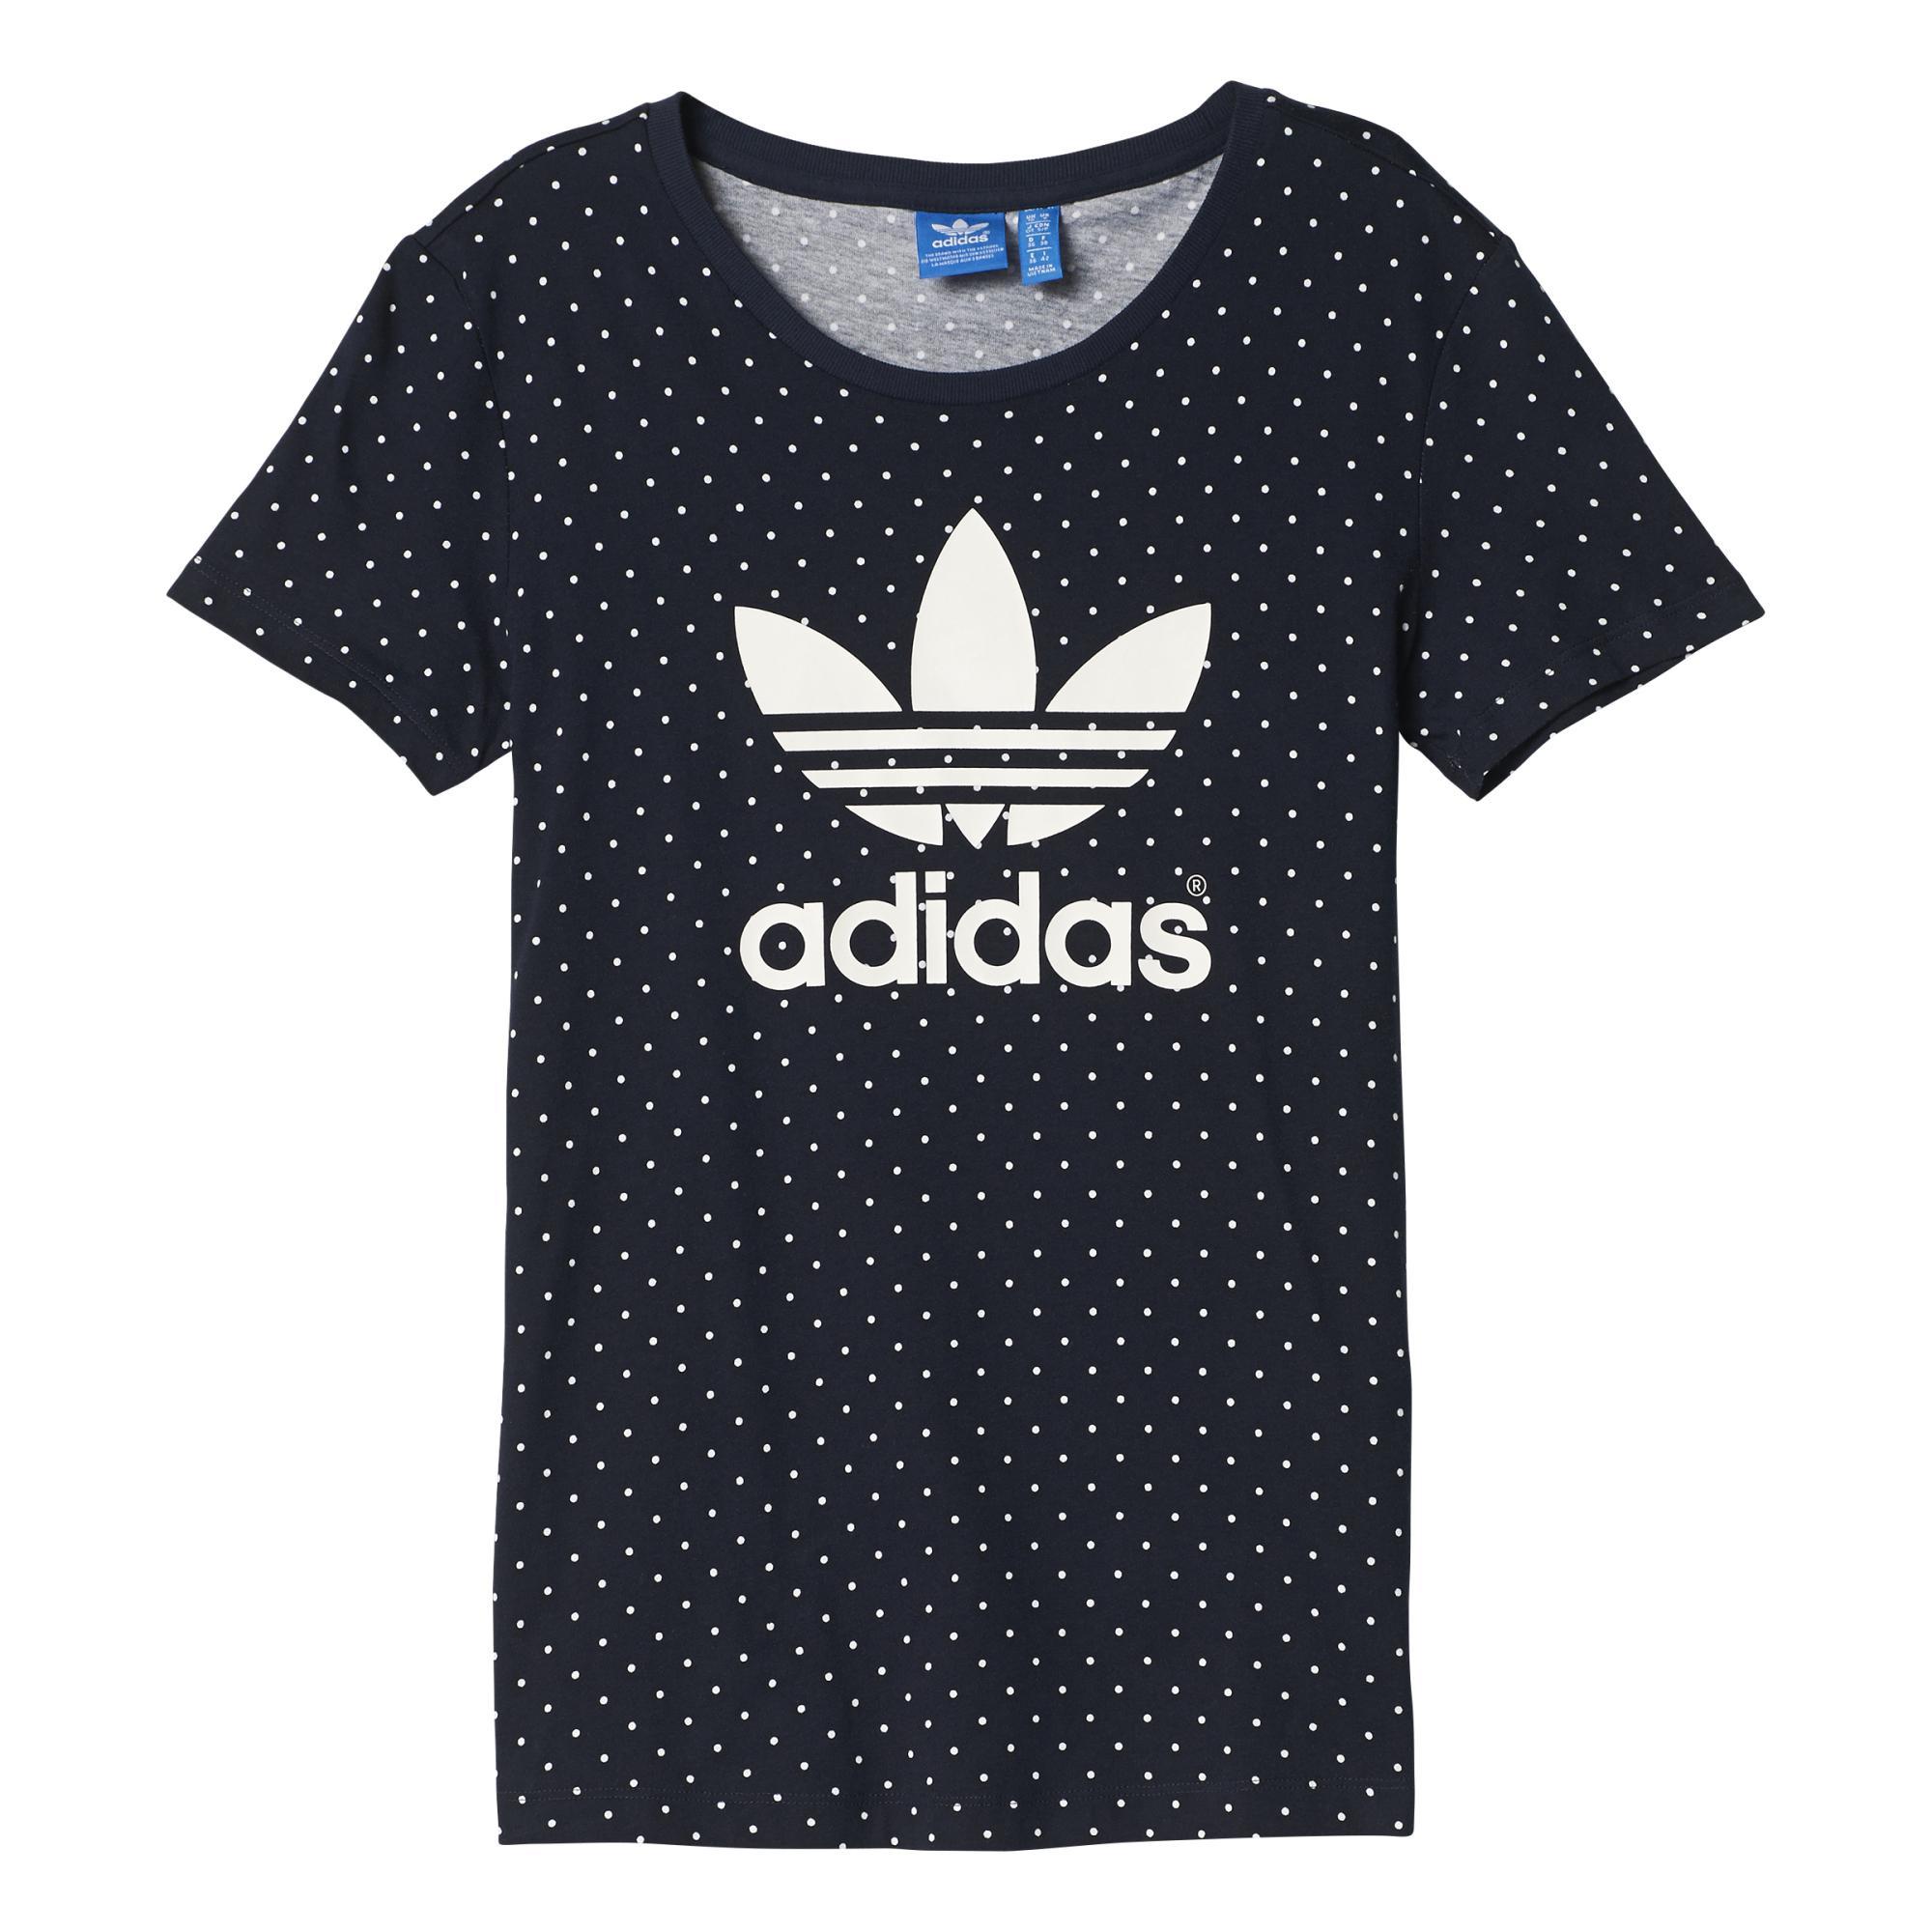 Originals Camiseta Aop Graphic Mujer Adidas Toposmarinoblanco CdoBrxe